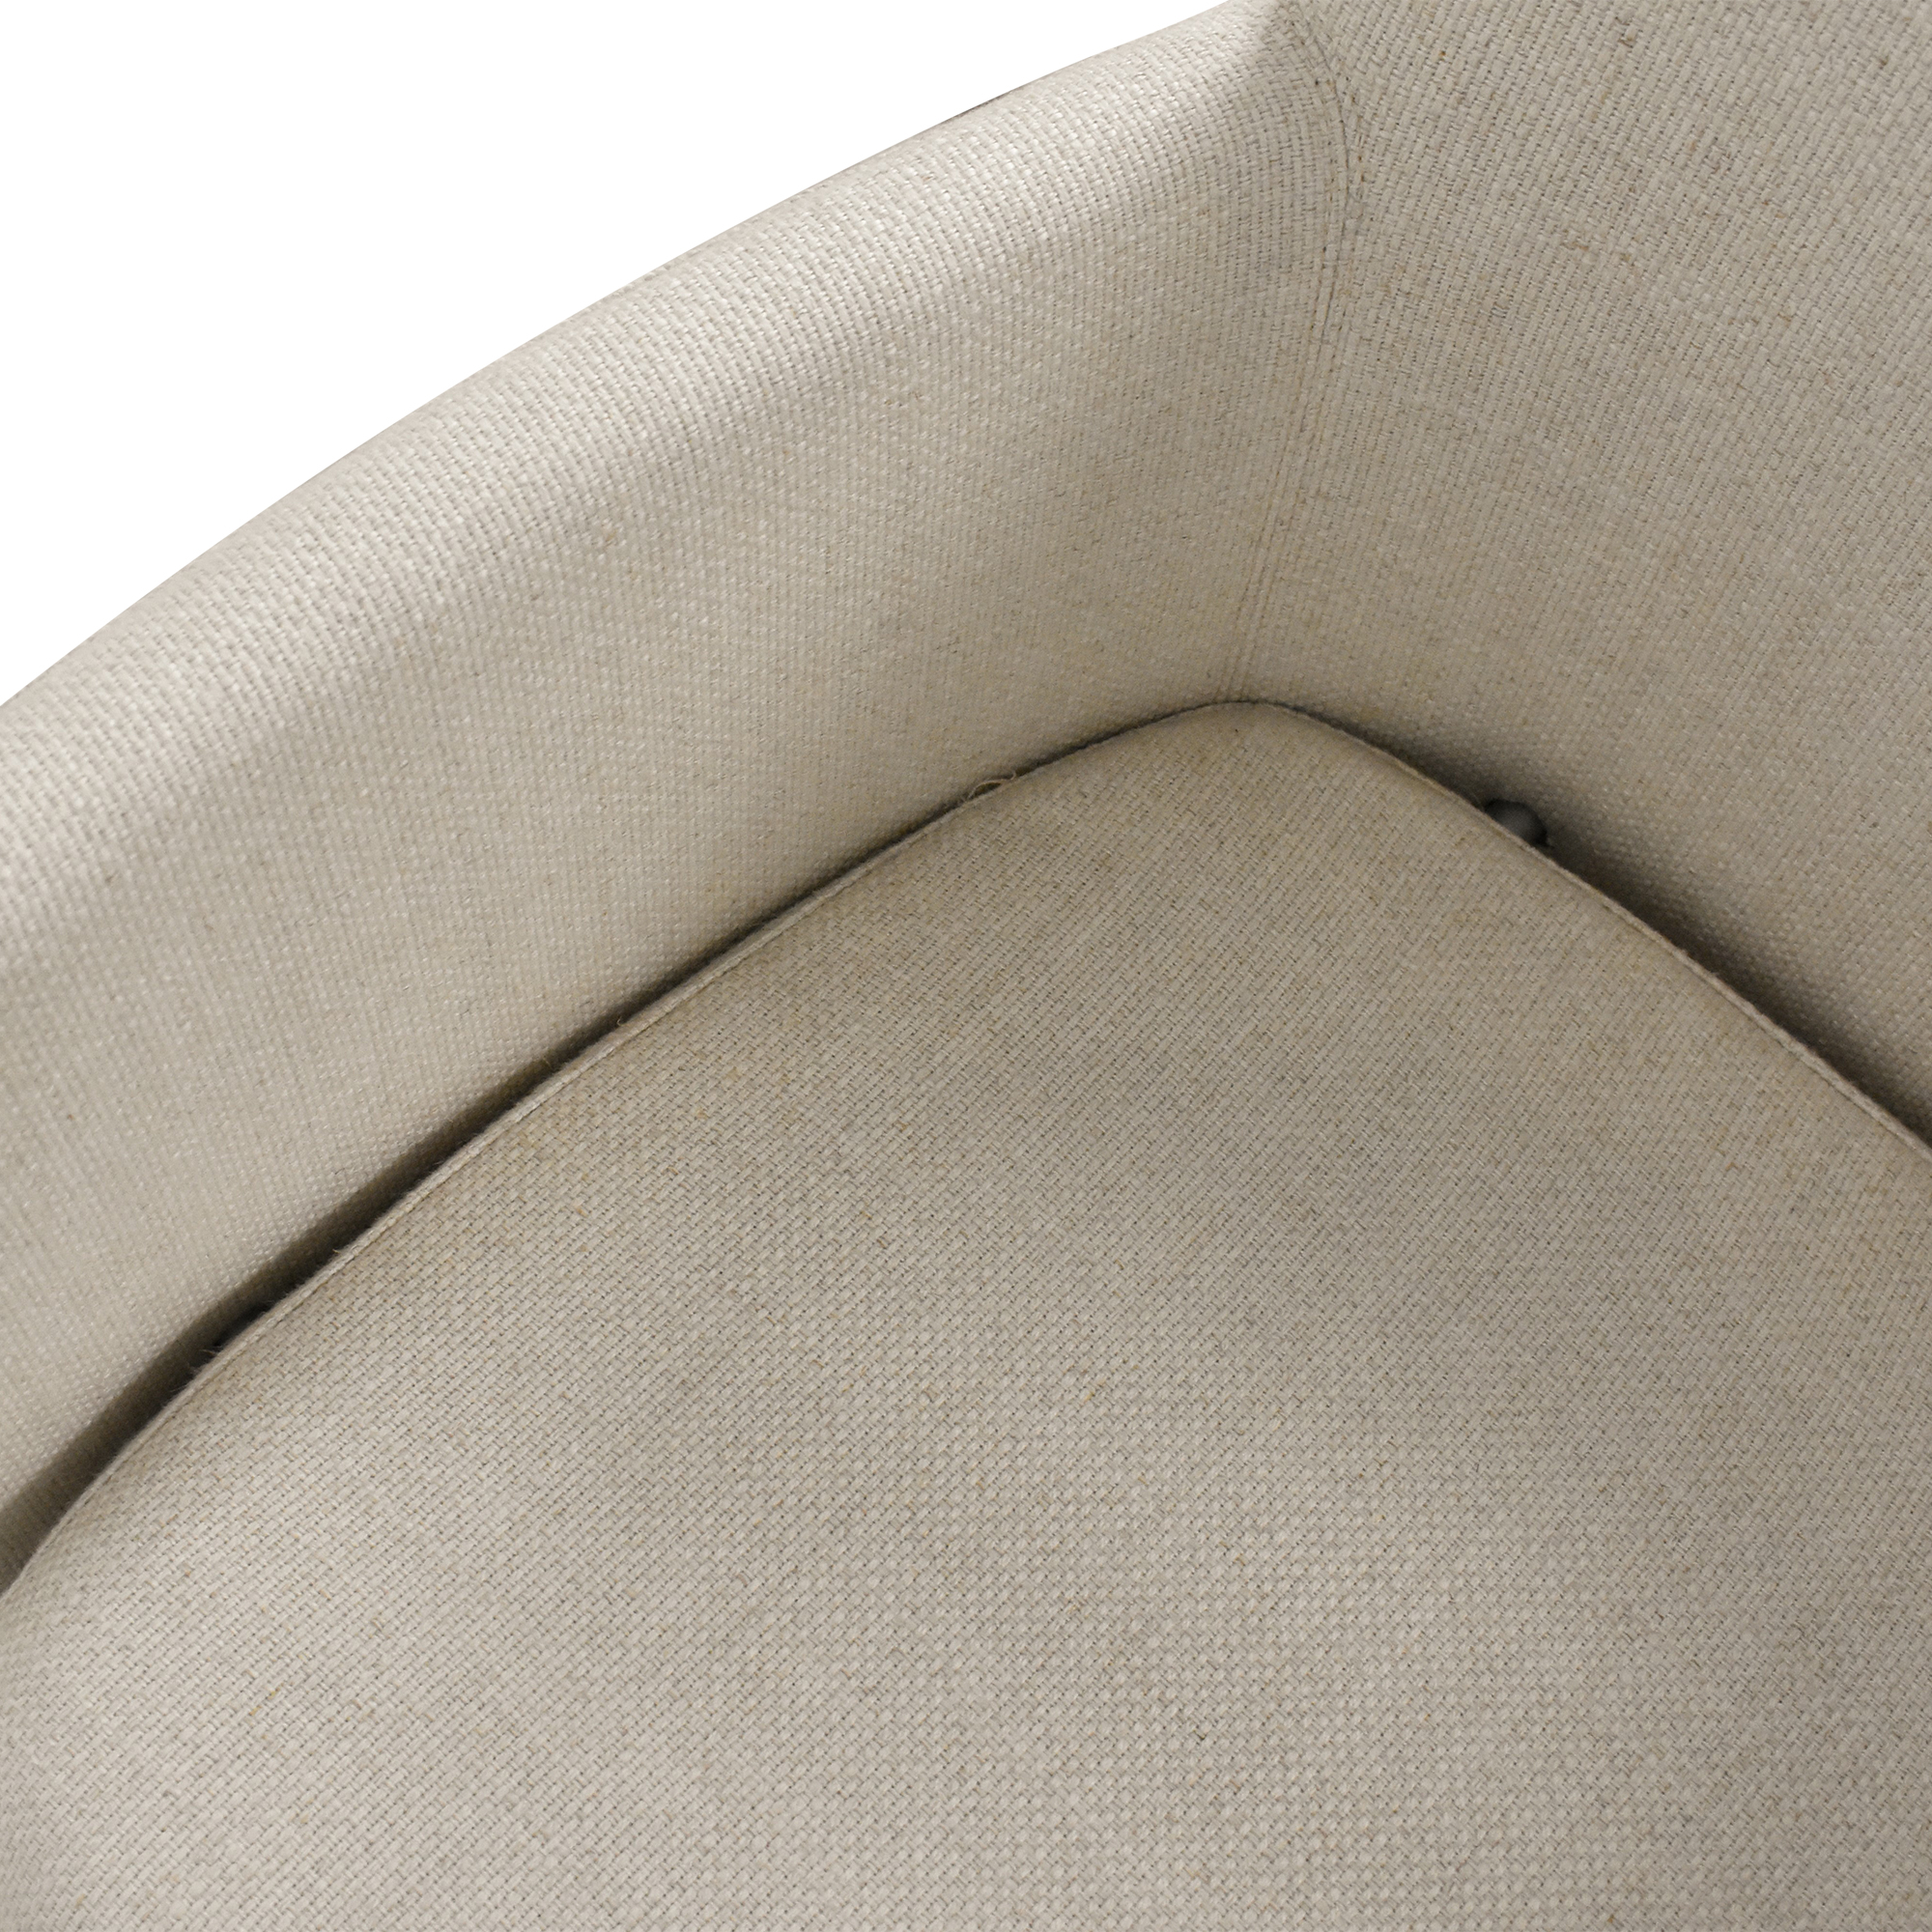 Casamilano Casamilano Clivia Chair for sale